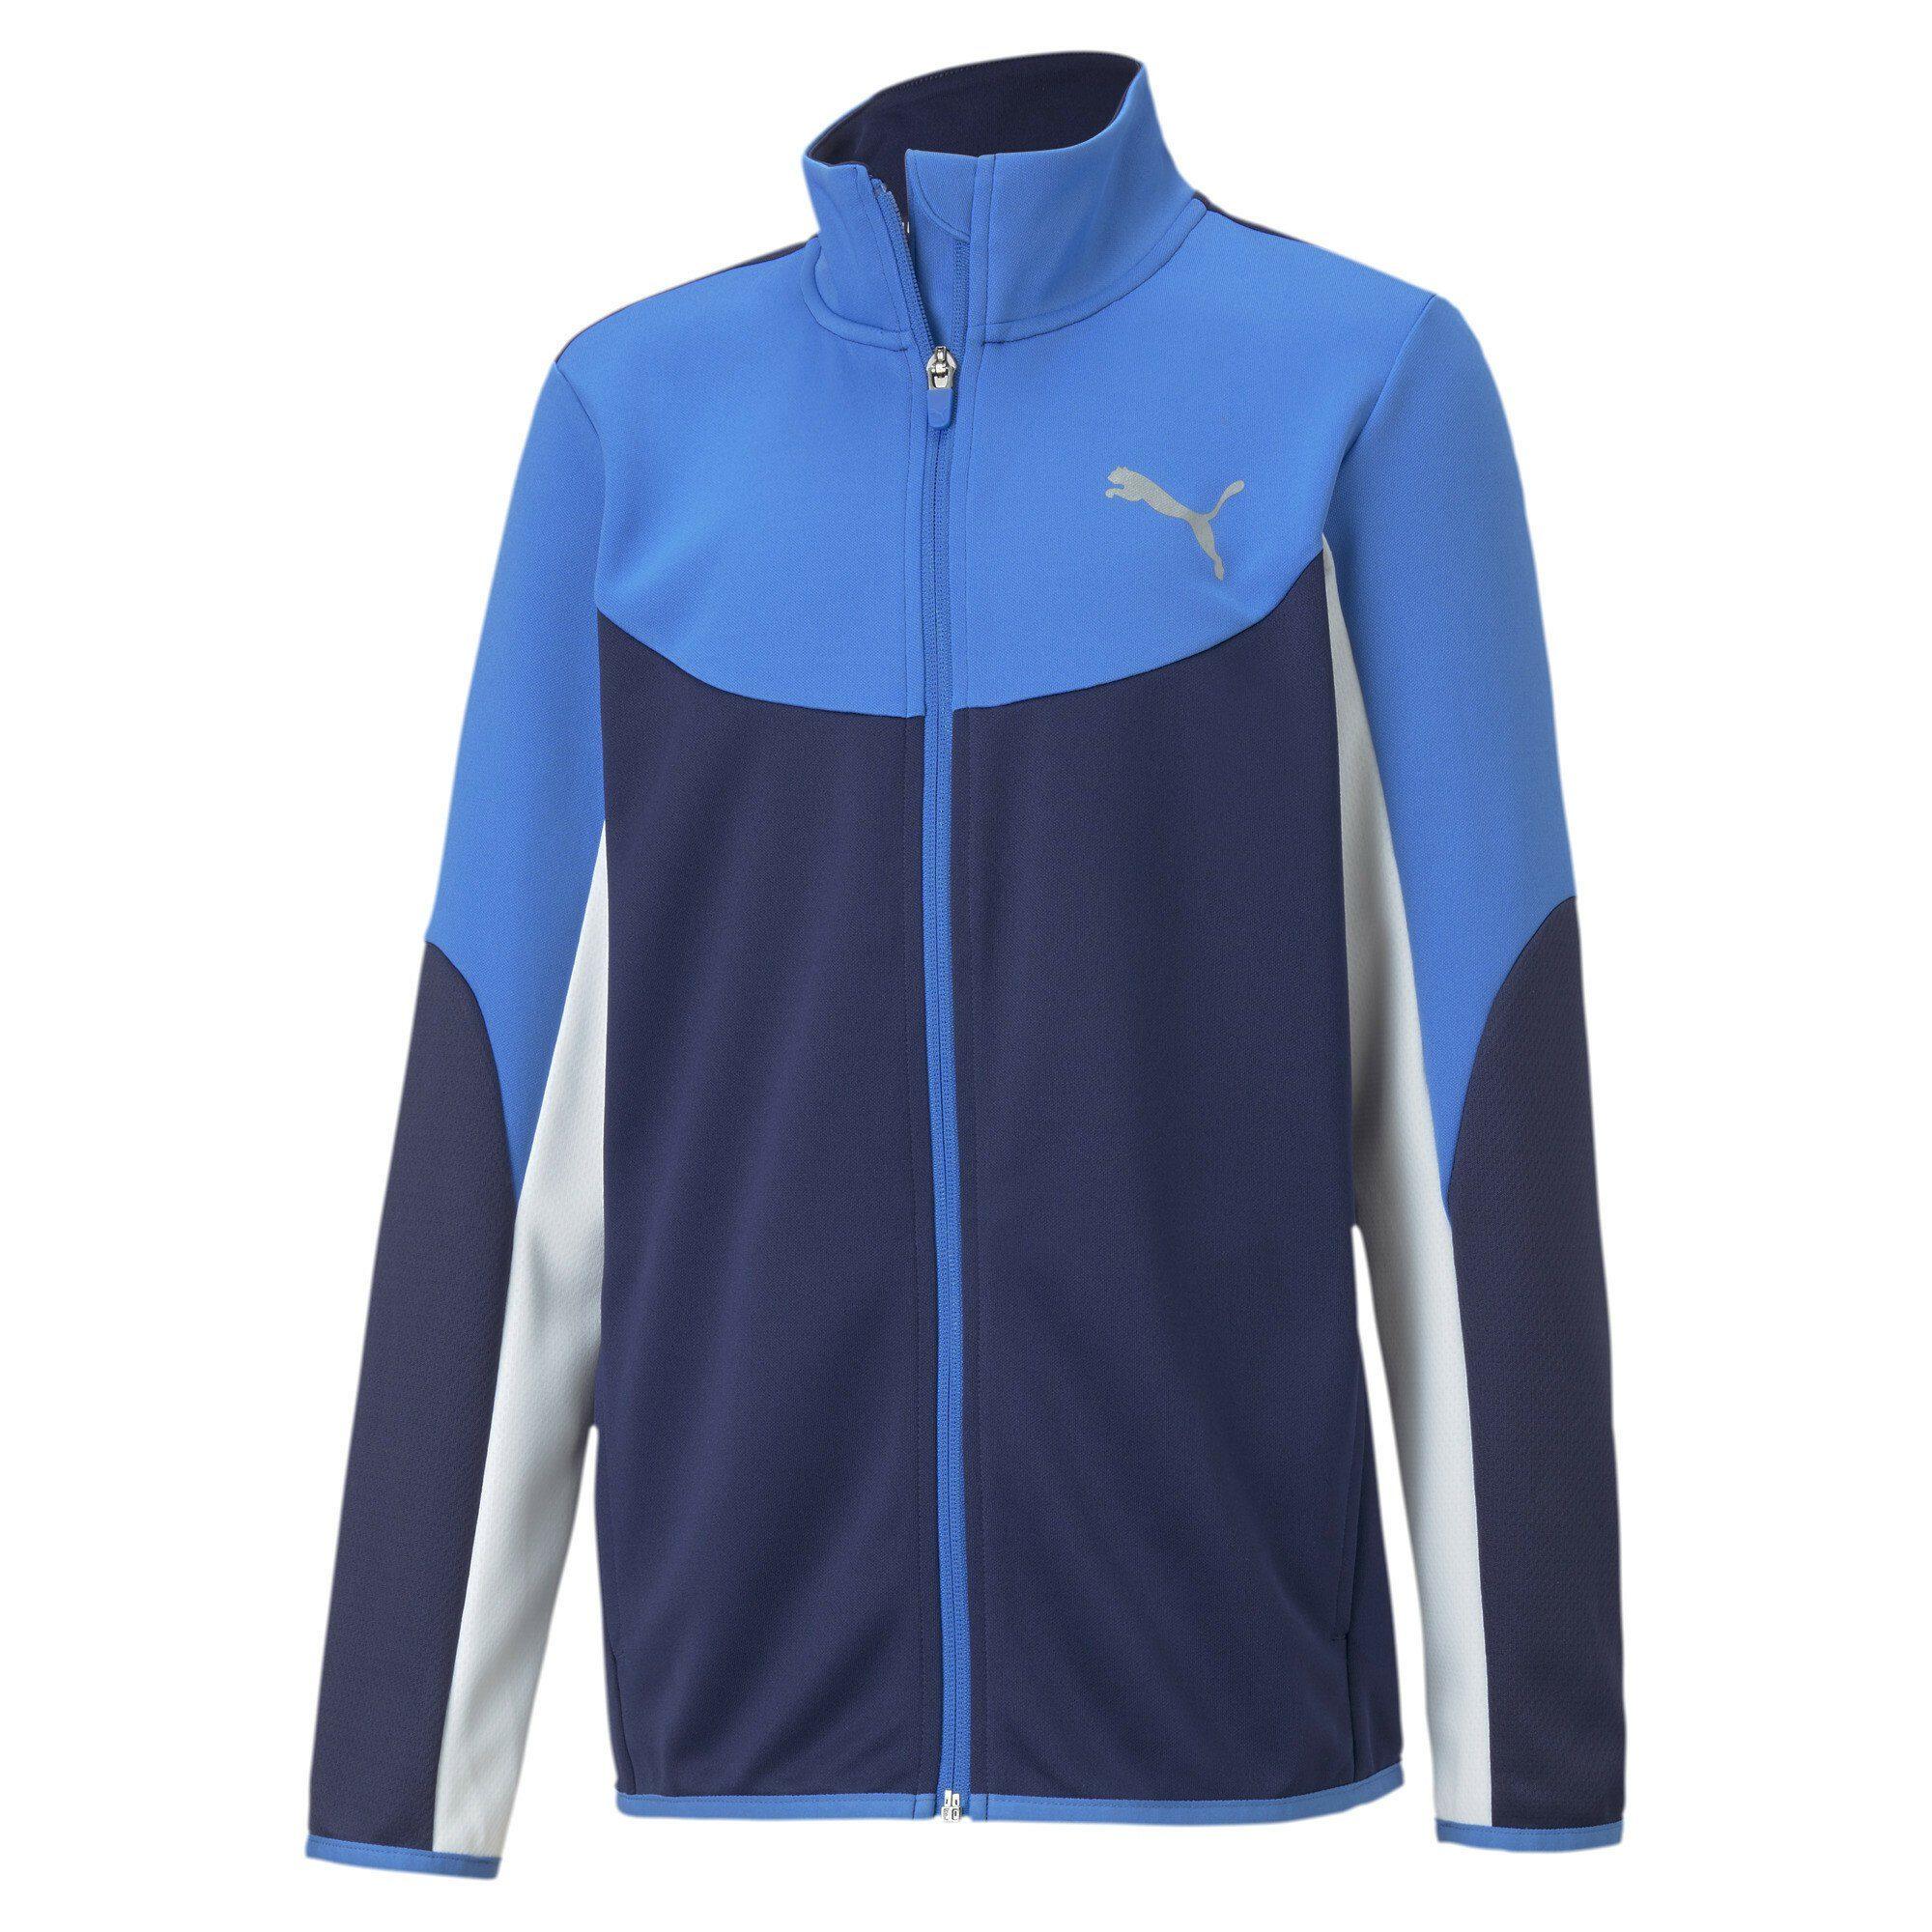 Herren,  Jungen,  Kinder PUMA Trainingsjacke »Active Sports Jungen Jacke«    04062451324353